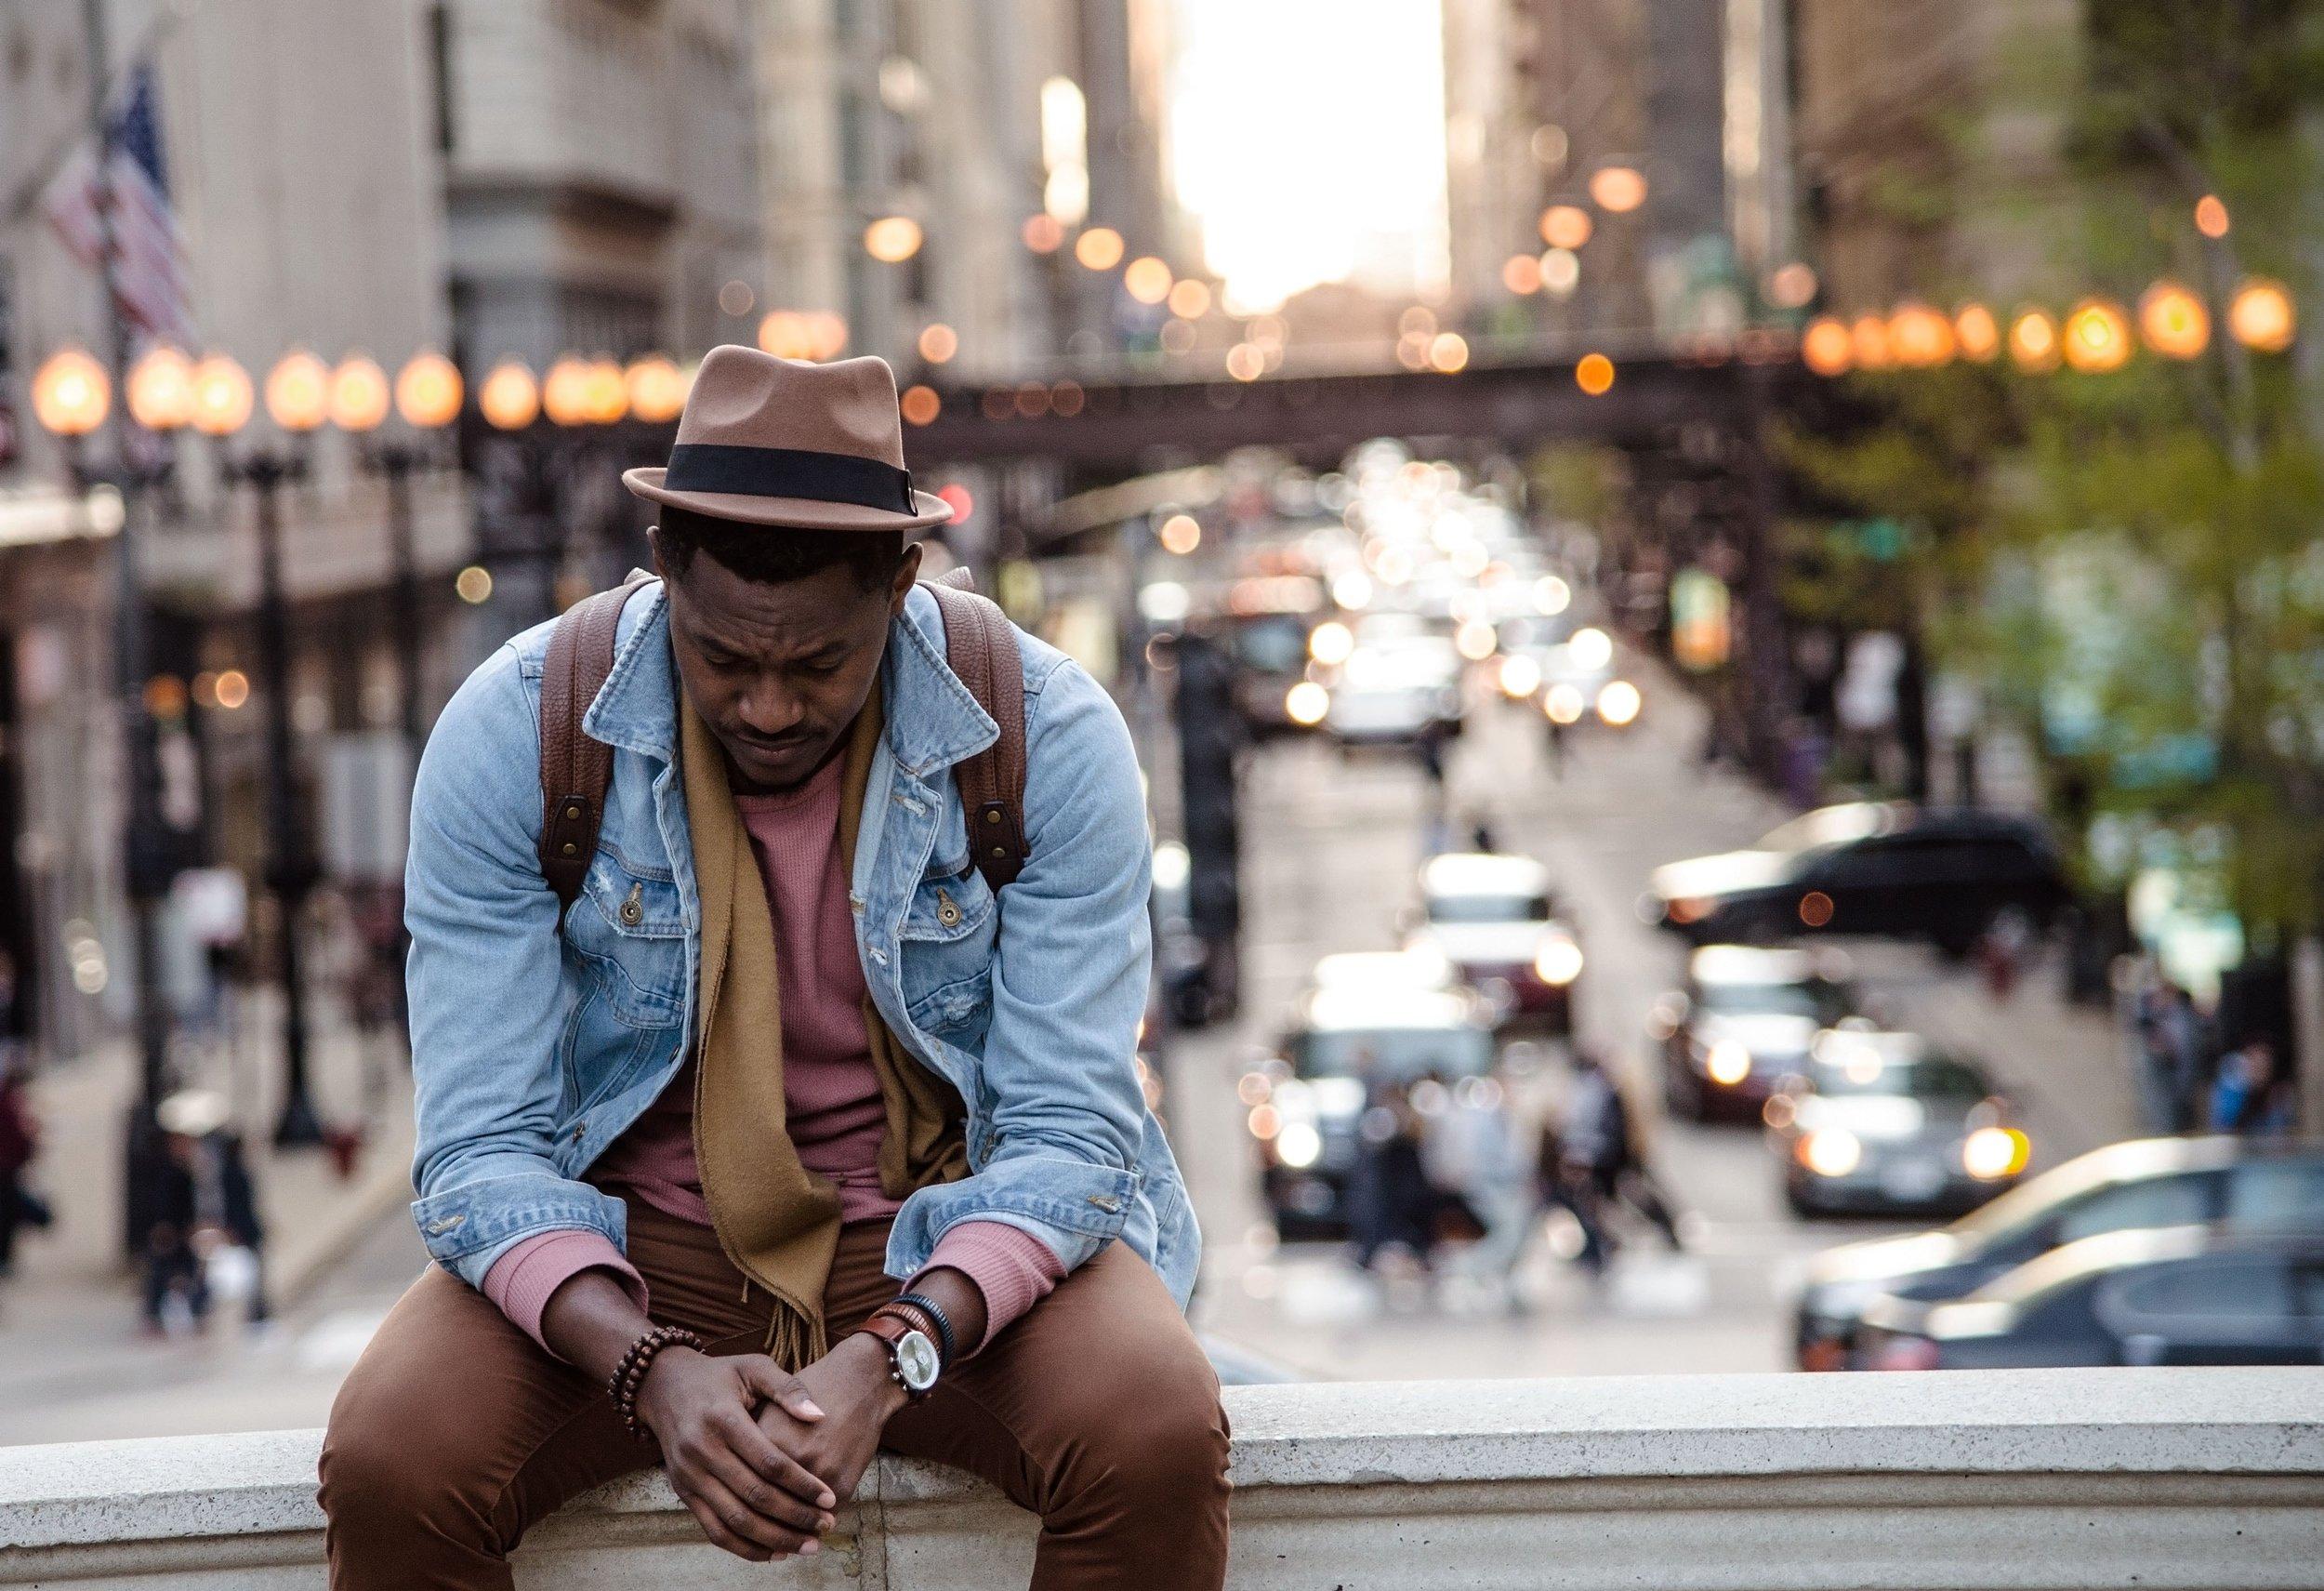 black man looking downwards sitting on ledge